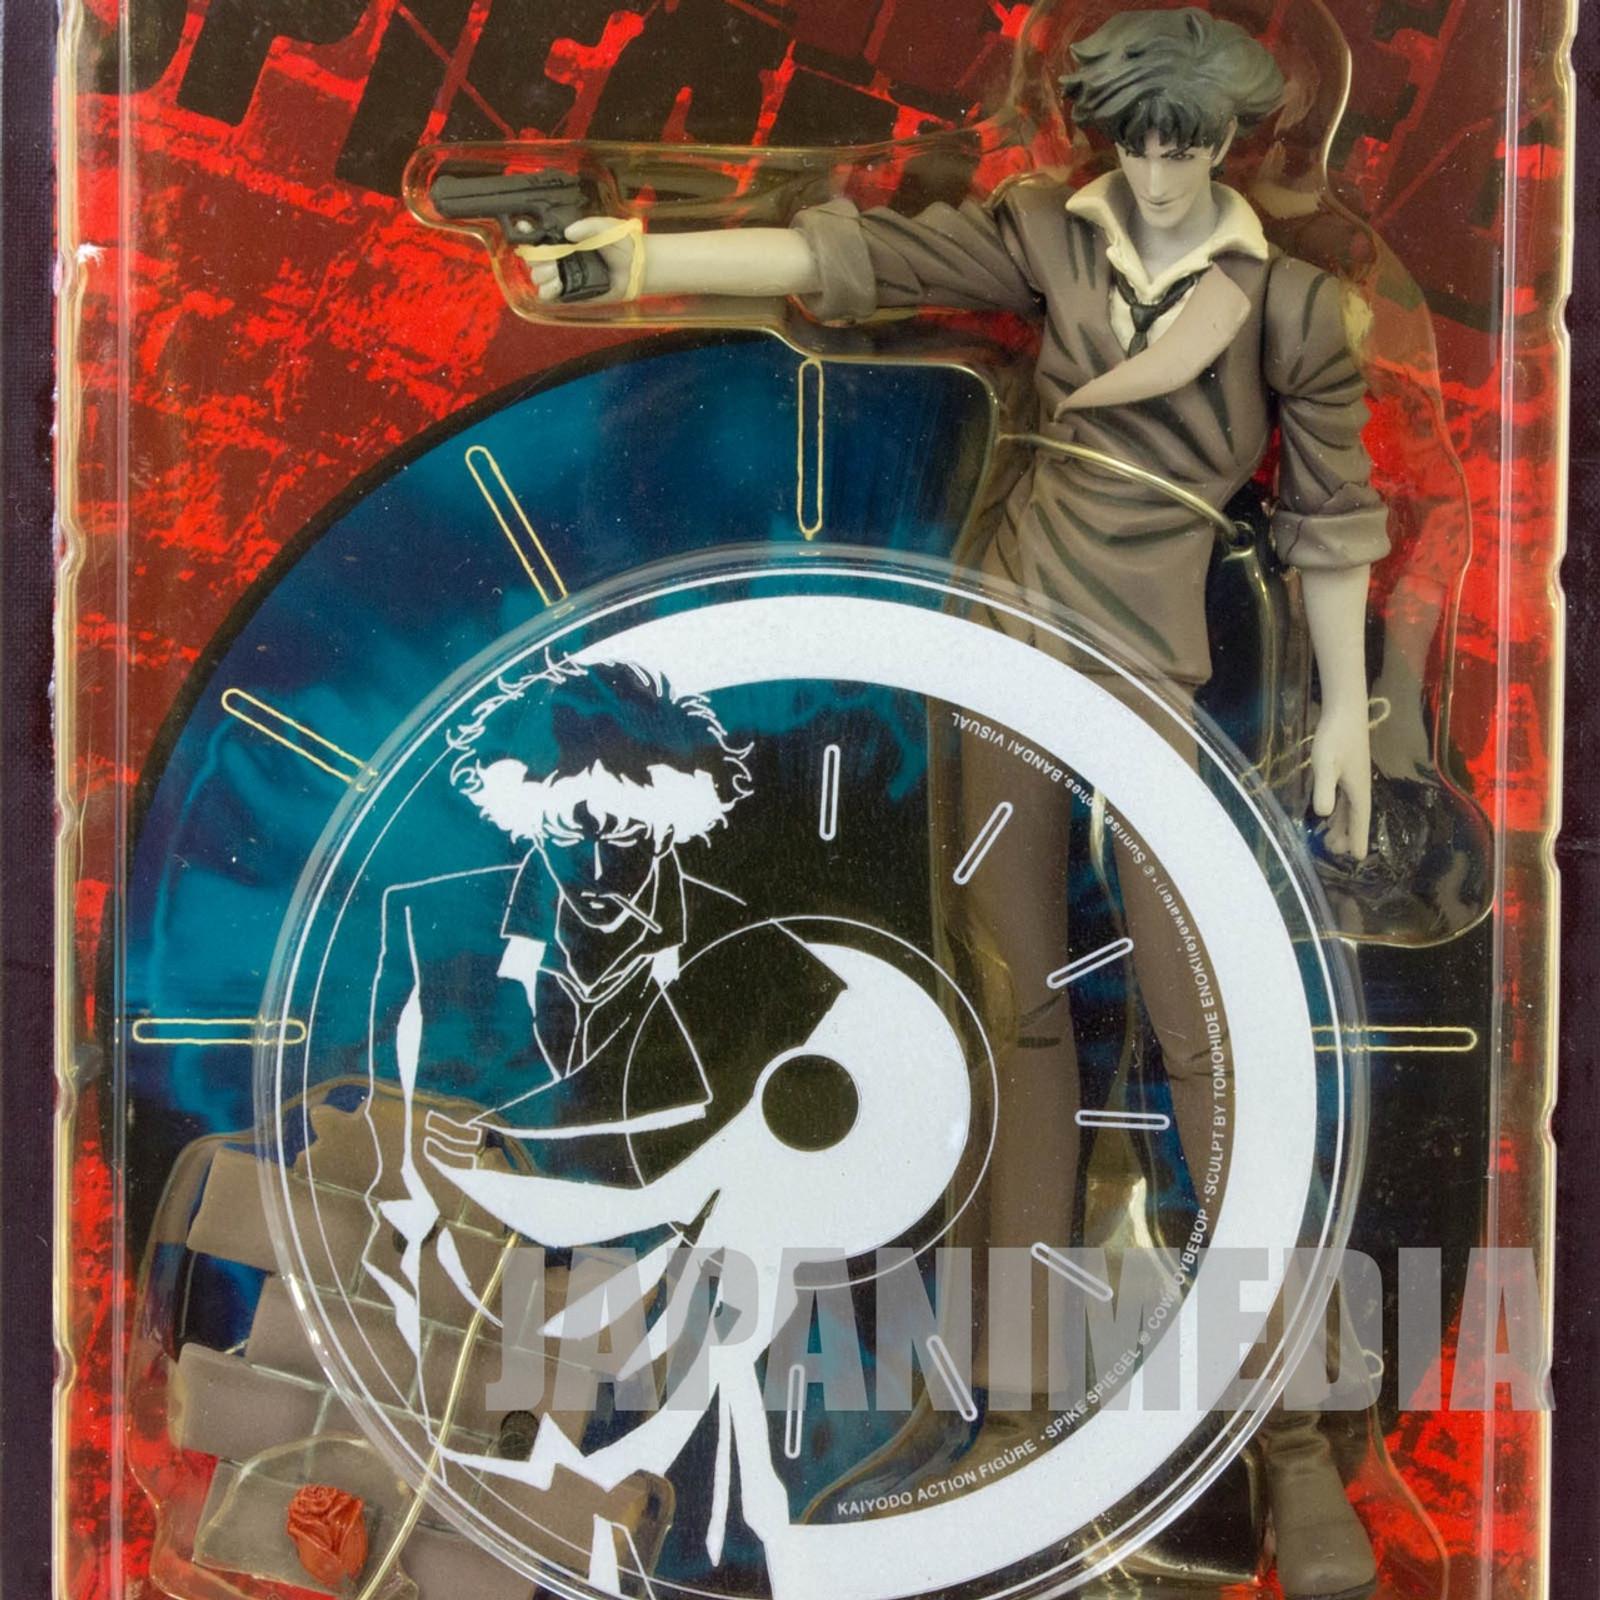 Cowboy Bebop Spike Spiegel FigureMonochrome ver. JCTC Kaiyodo JAPAN ANIME MANGA